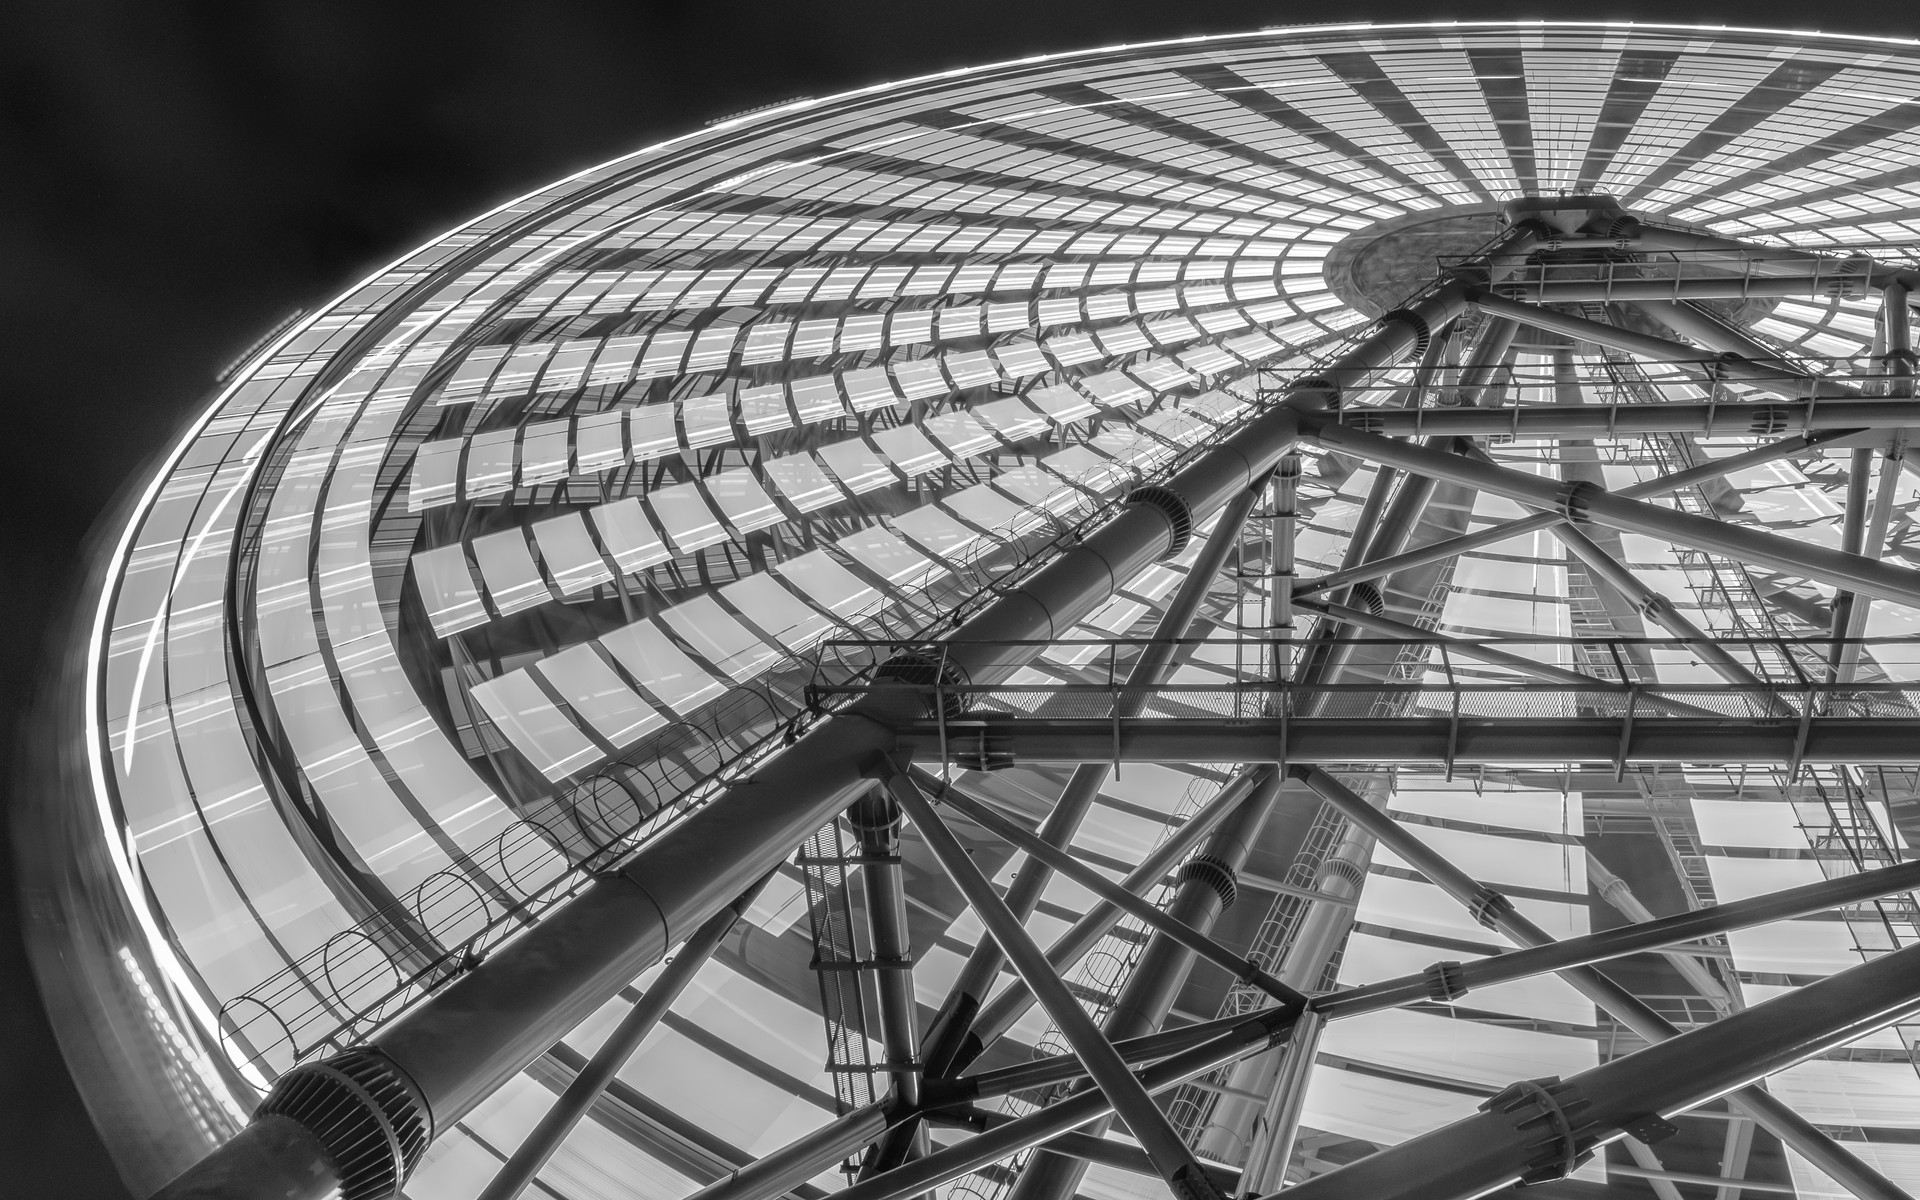 Osaka Ferris Wheel